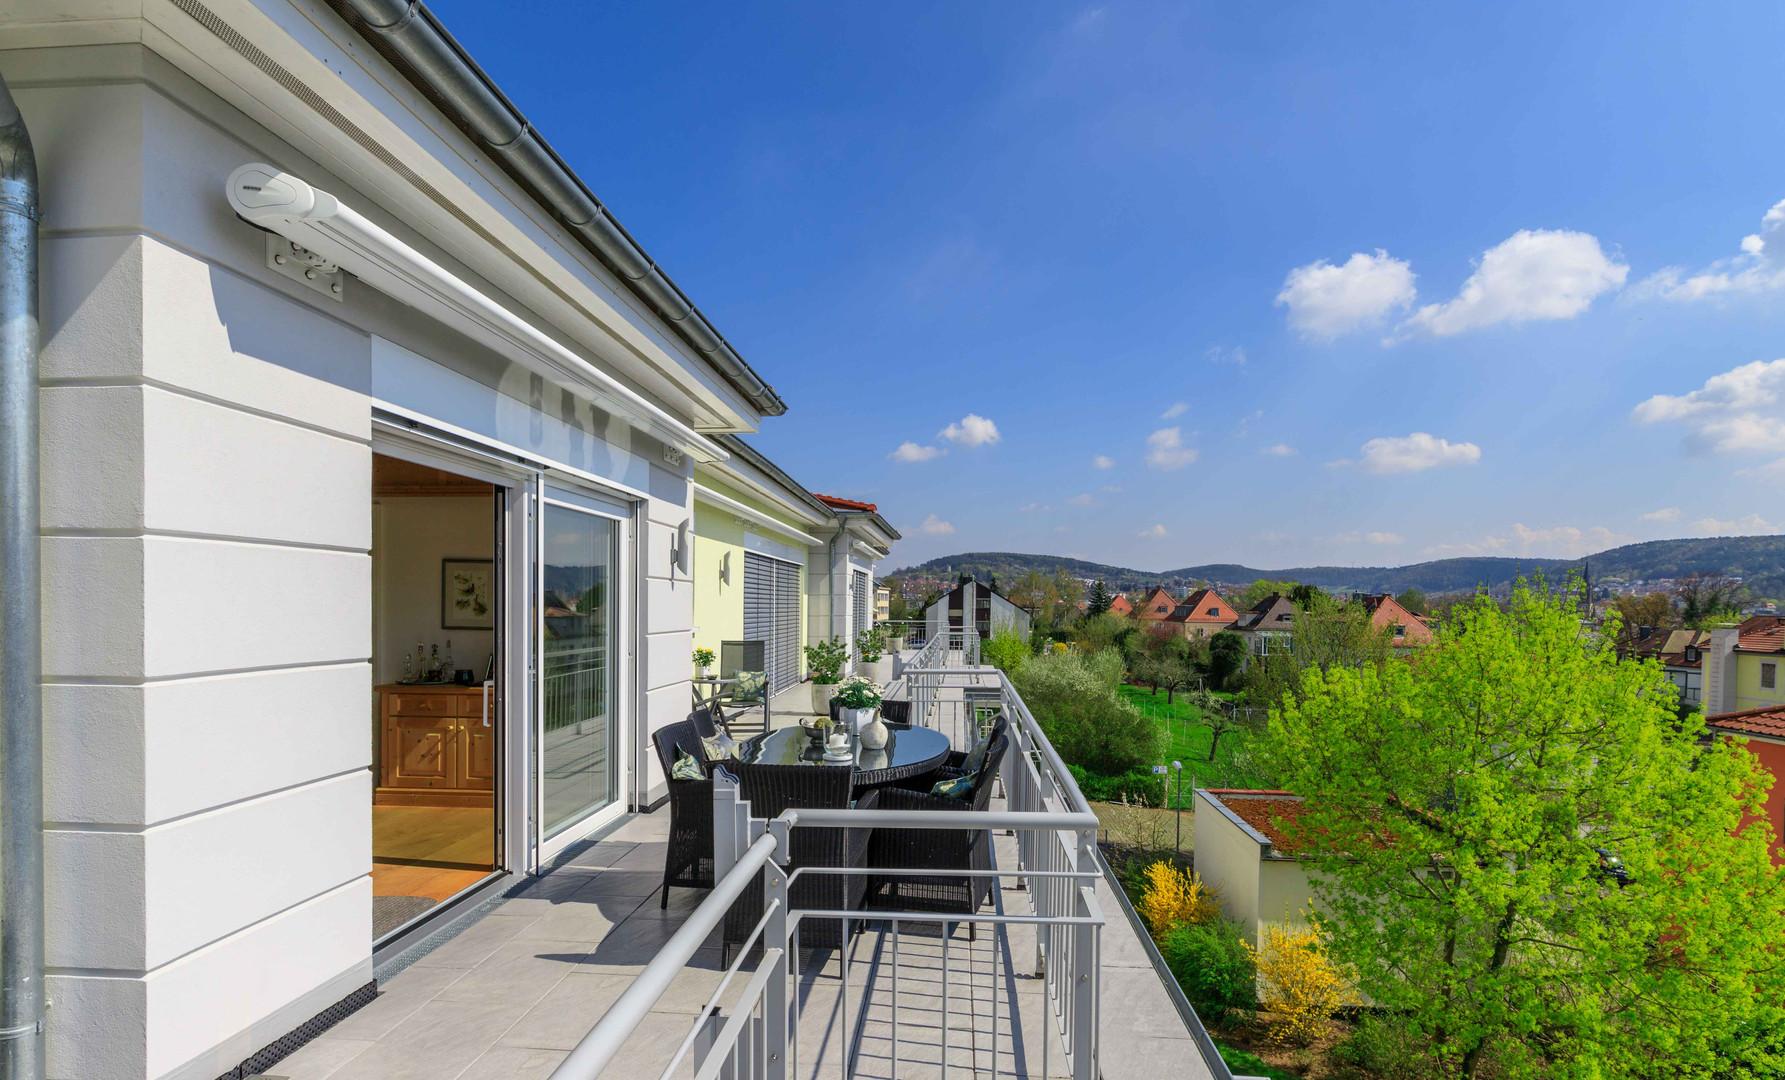 Penthouse in Bad Kissingen